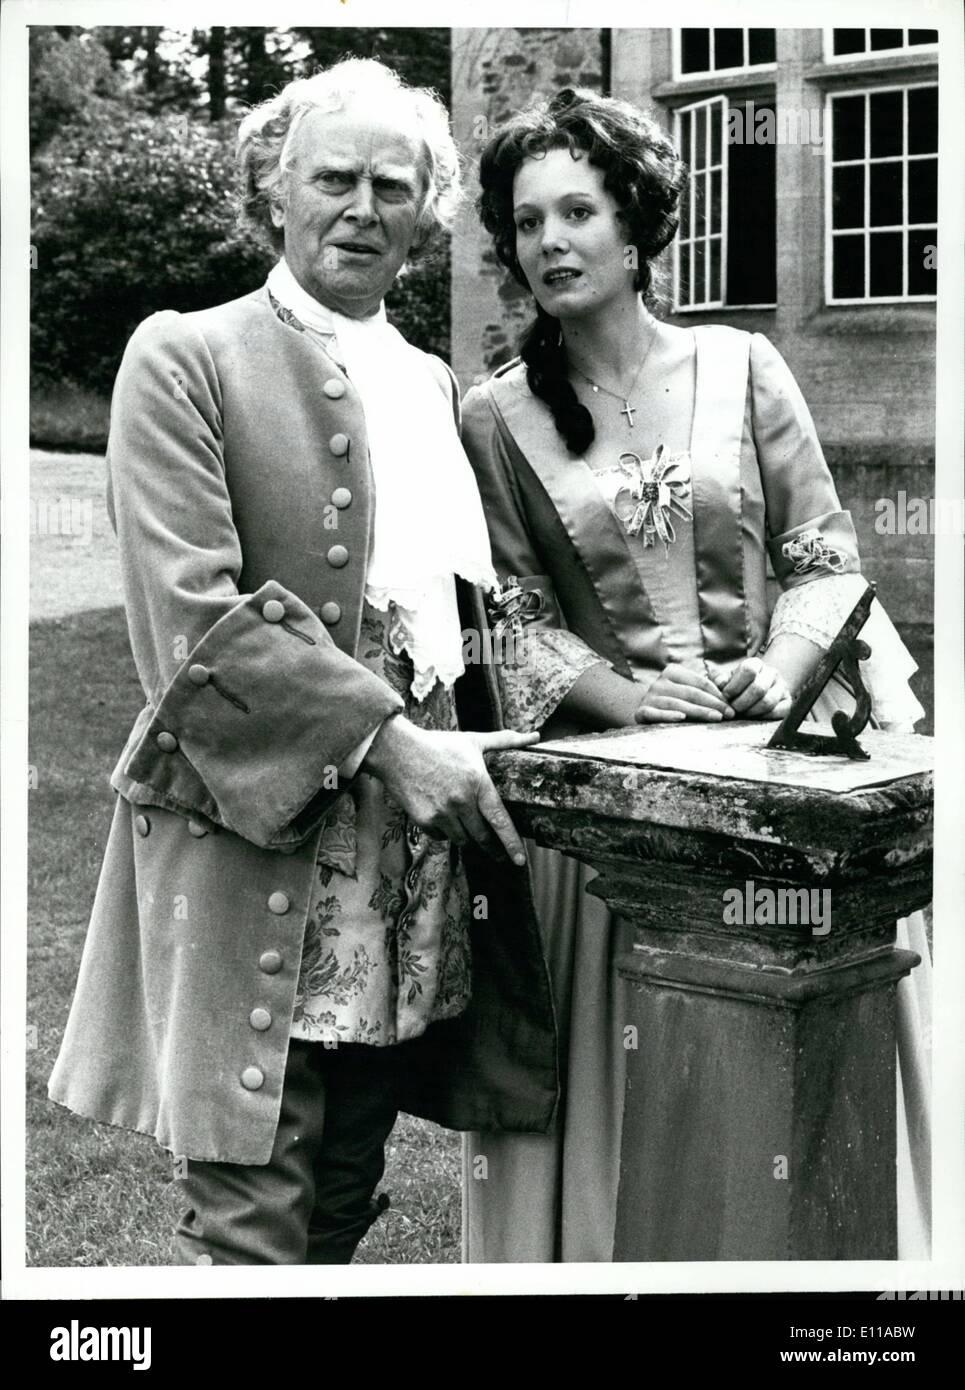 Jun. 06, 1976 - Ralph Michael, as Sir Frederick Vernon with Jane Wymark